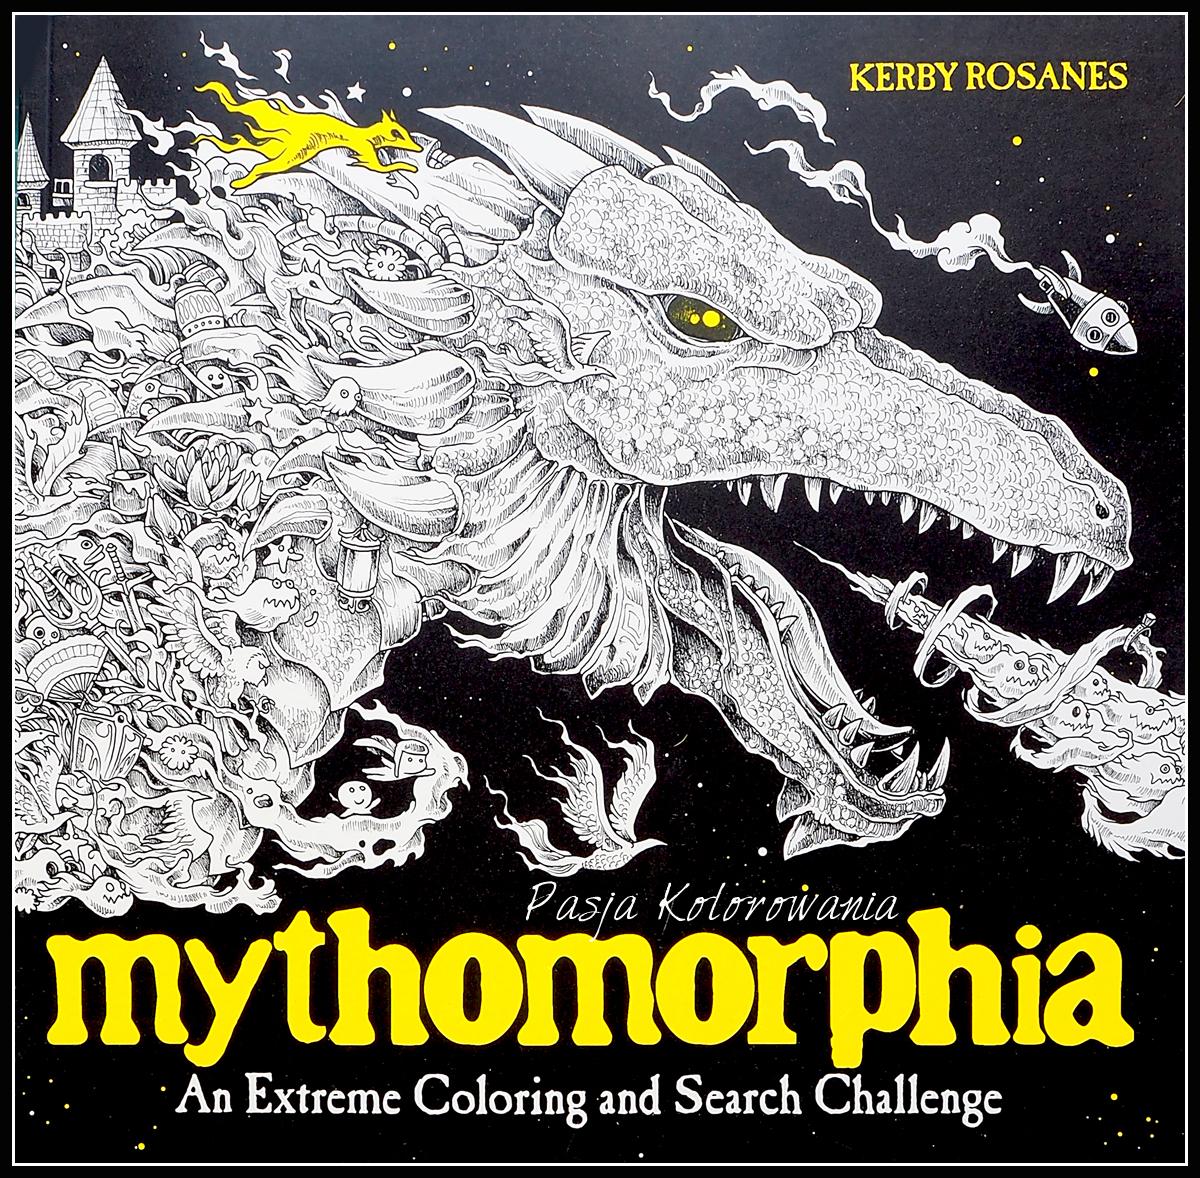 kolorowanka Mythomorphia Kerby Rosanes